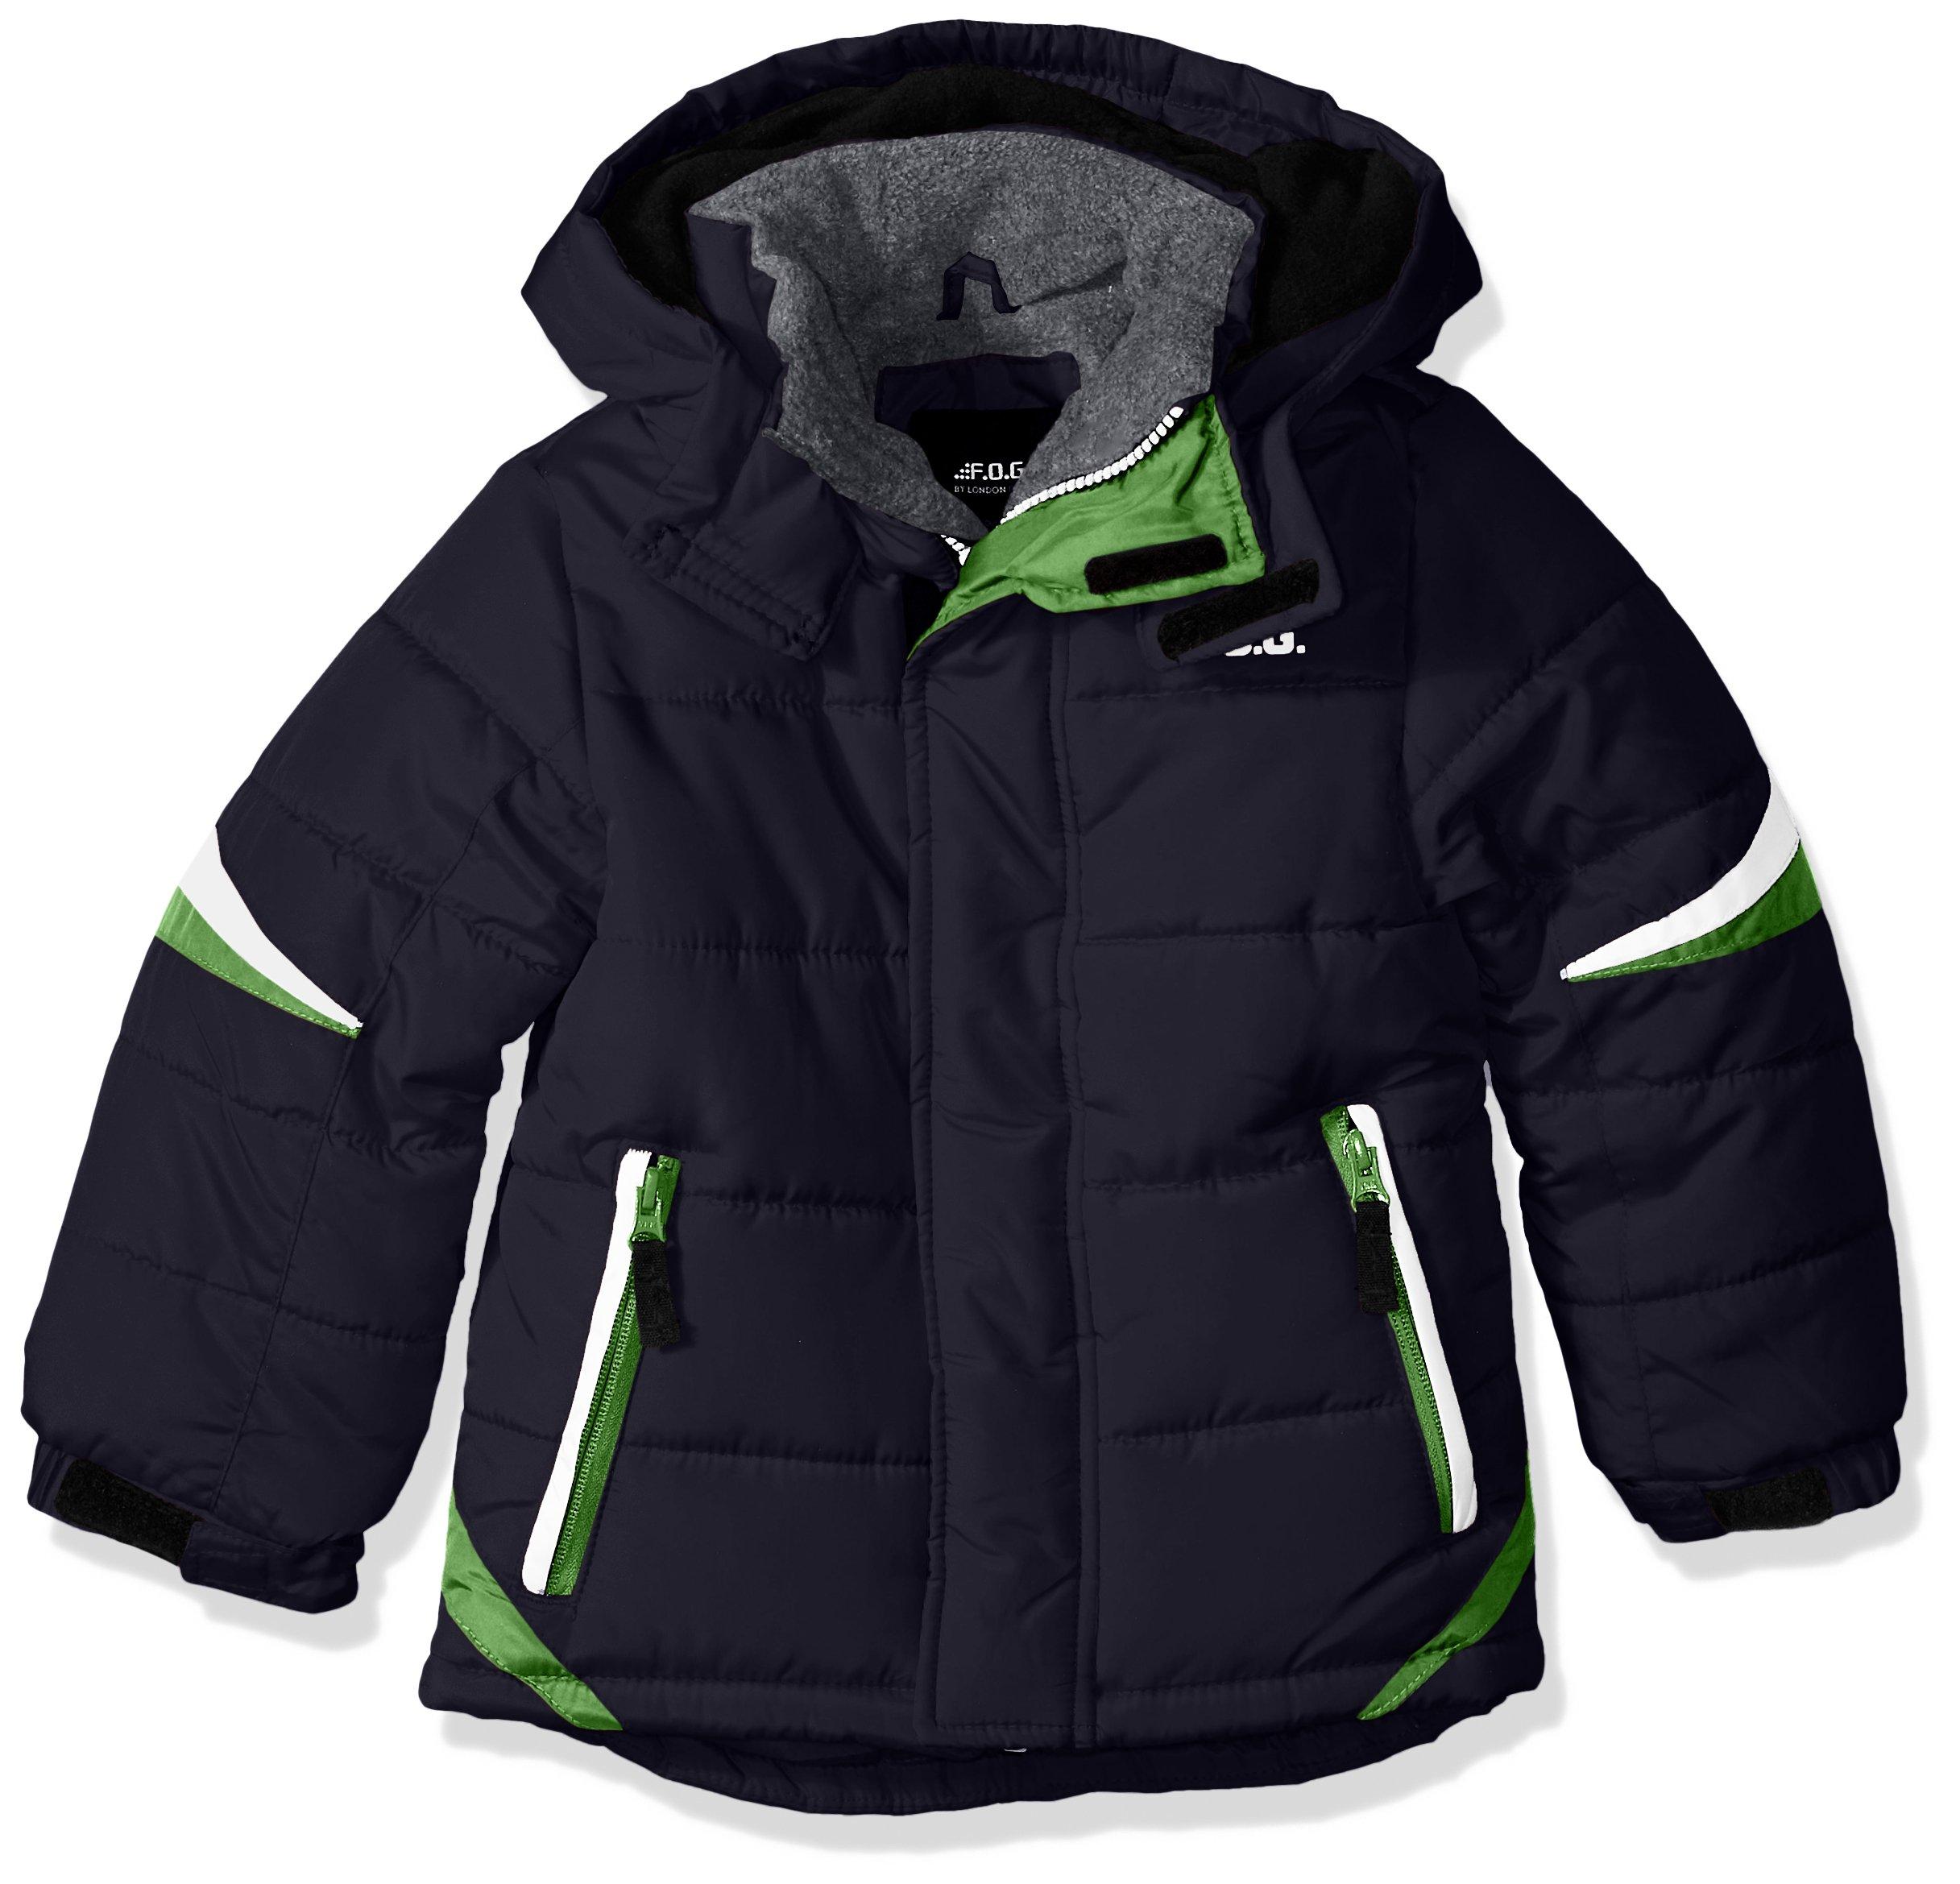 London Fog Big Boys' Active Puffer Jacket Winter Coat, Super Navy, 10/12